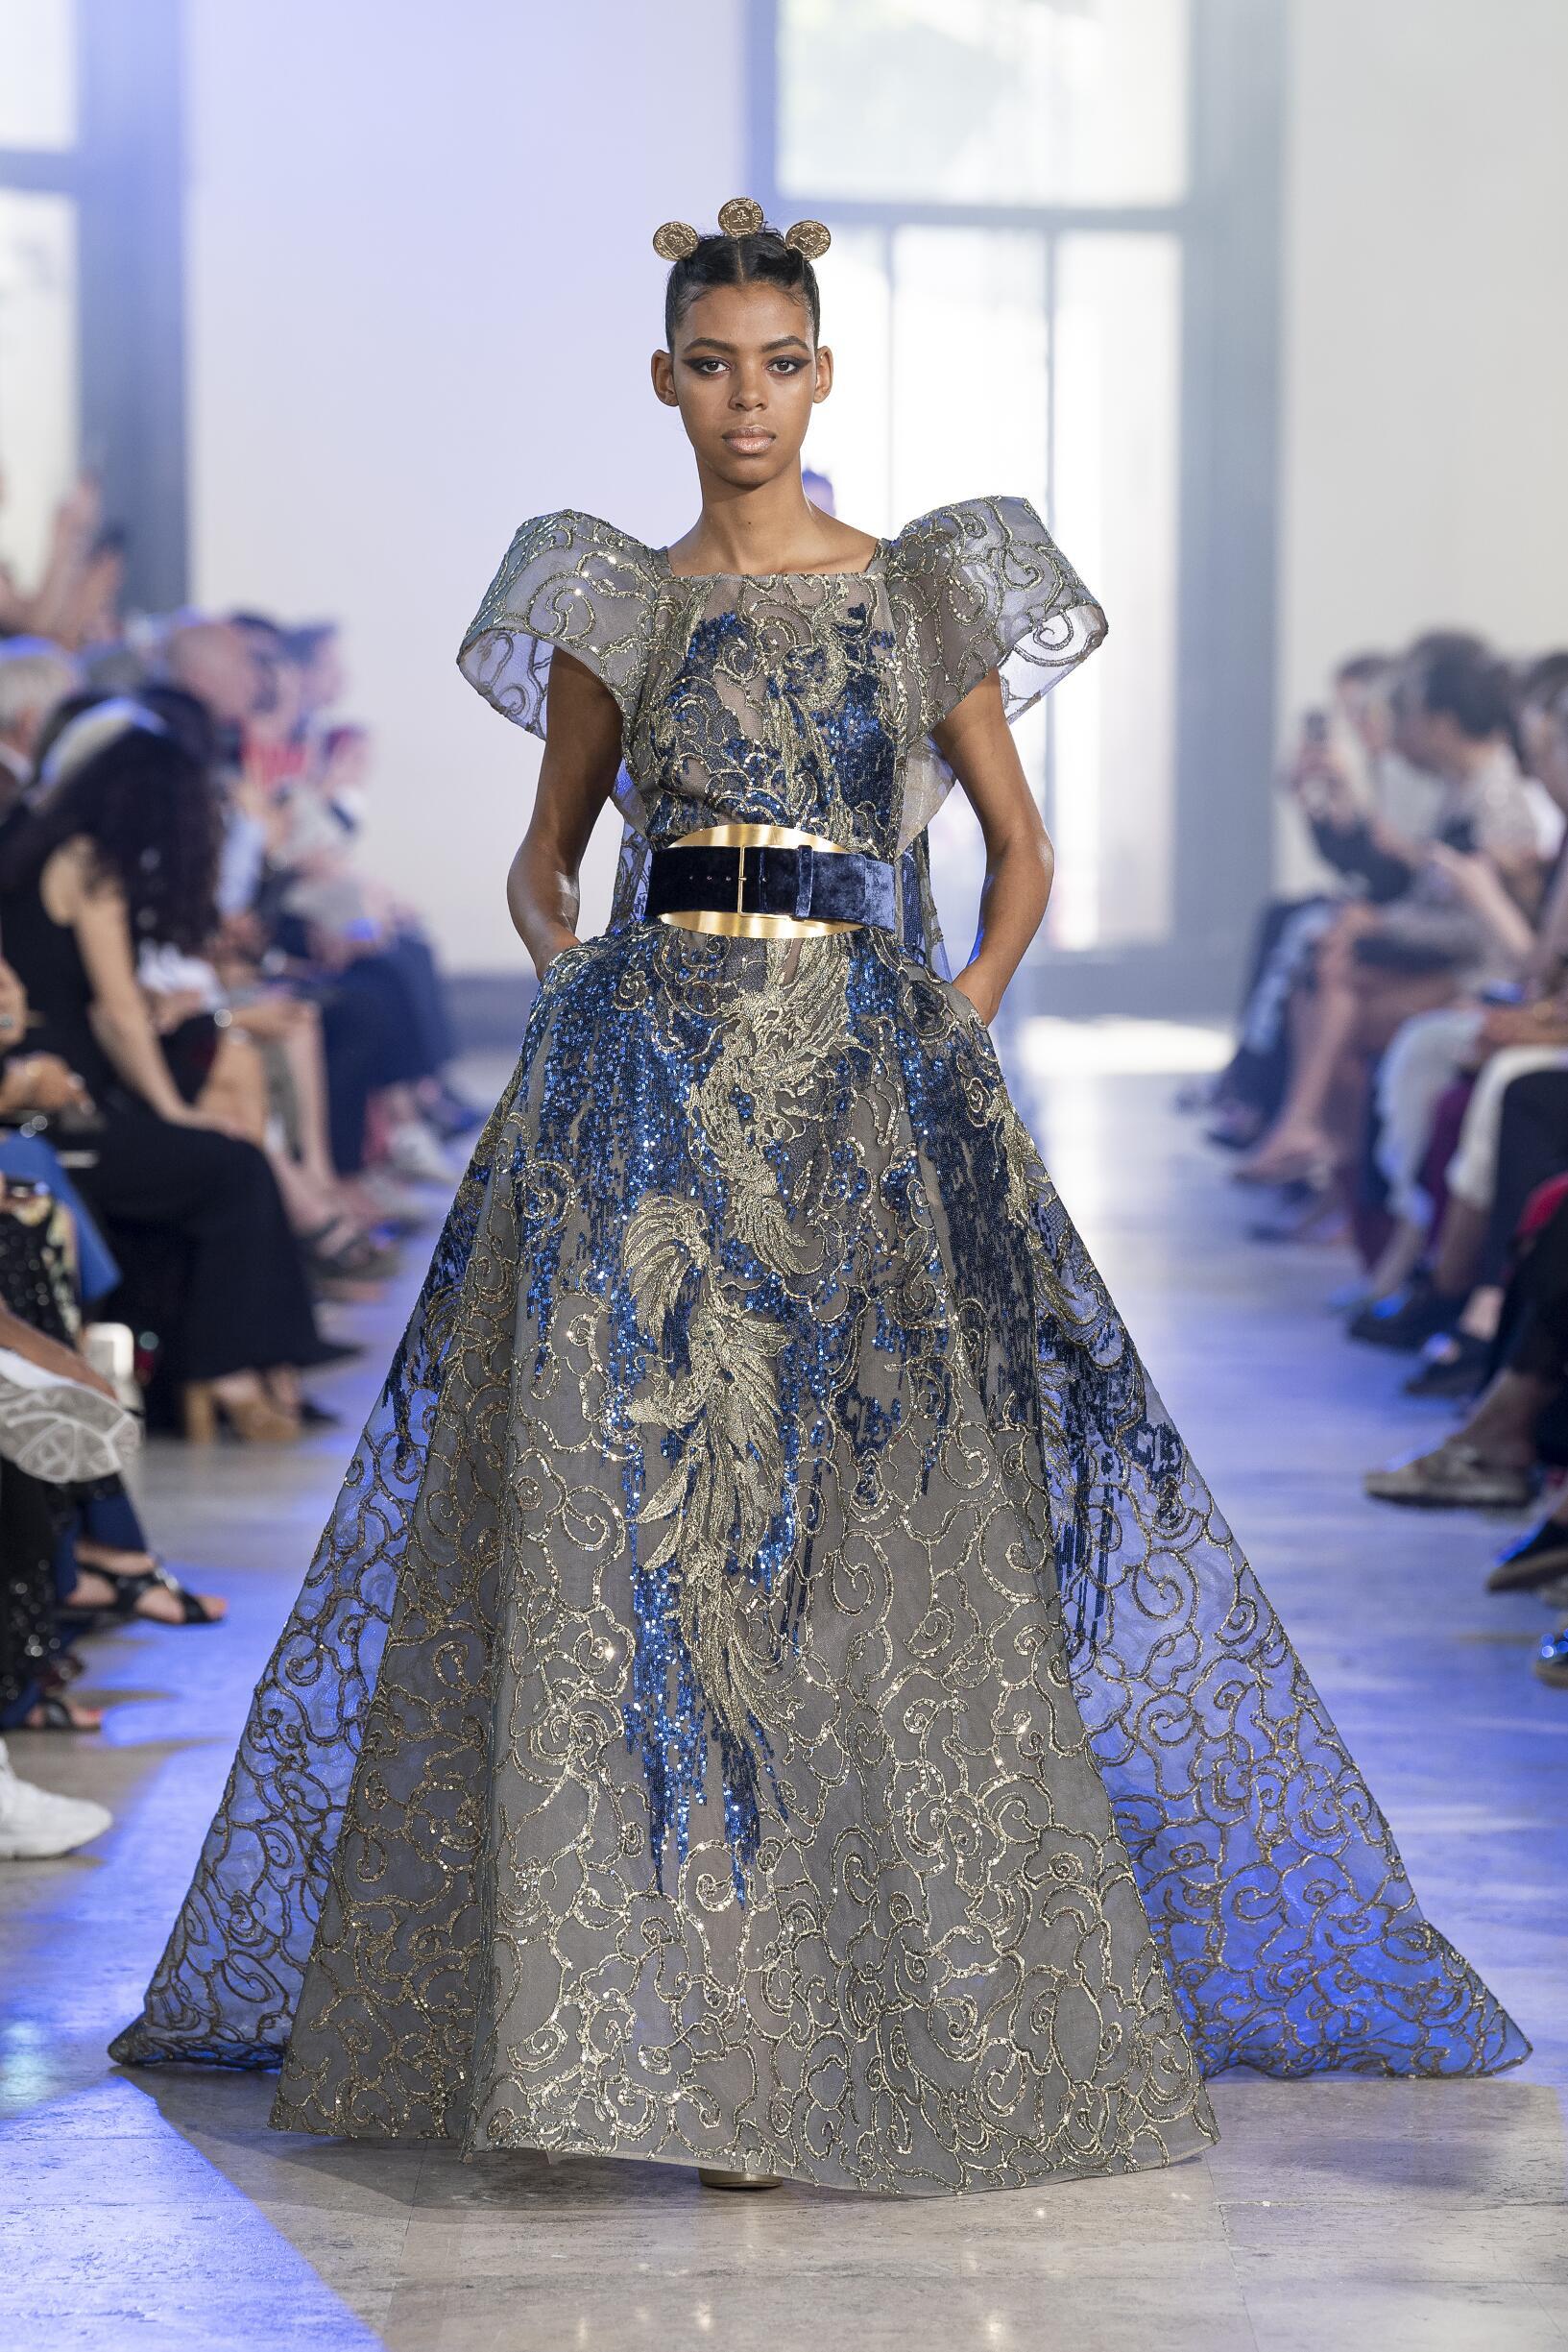 2019-20 Catwalk Elie Saab Haute Couture Woman Fashion Show Winter